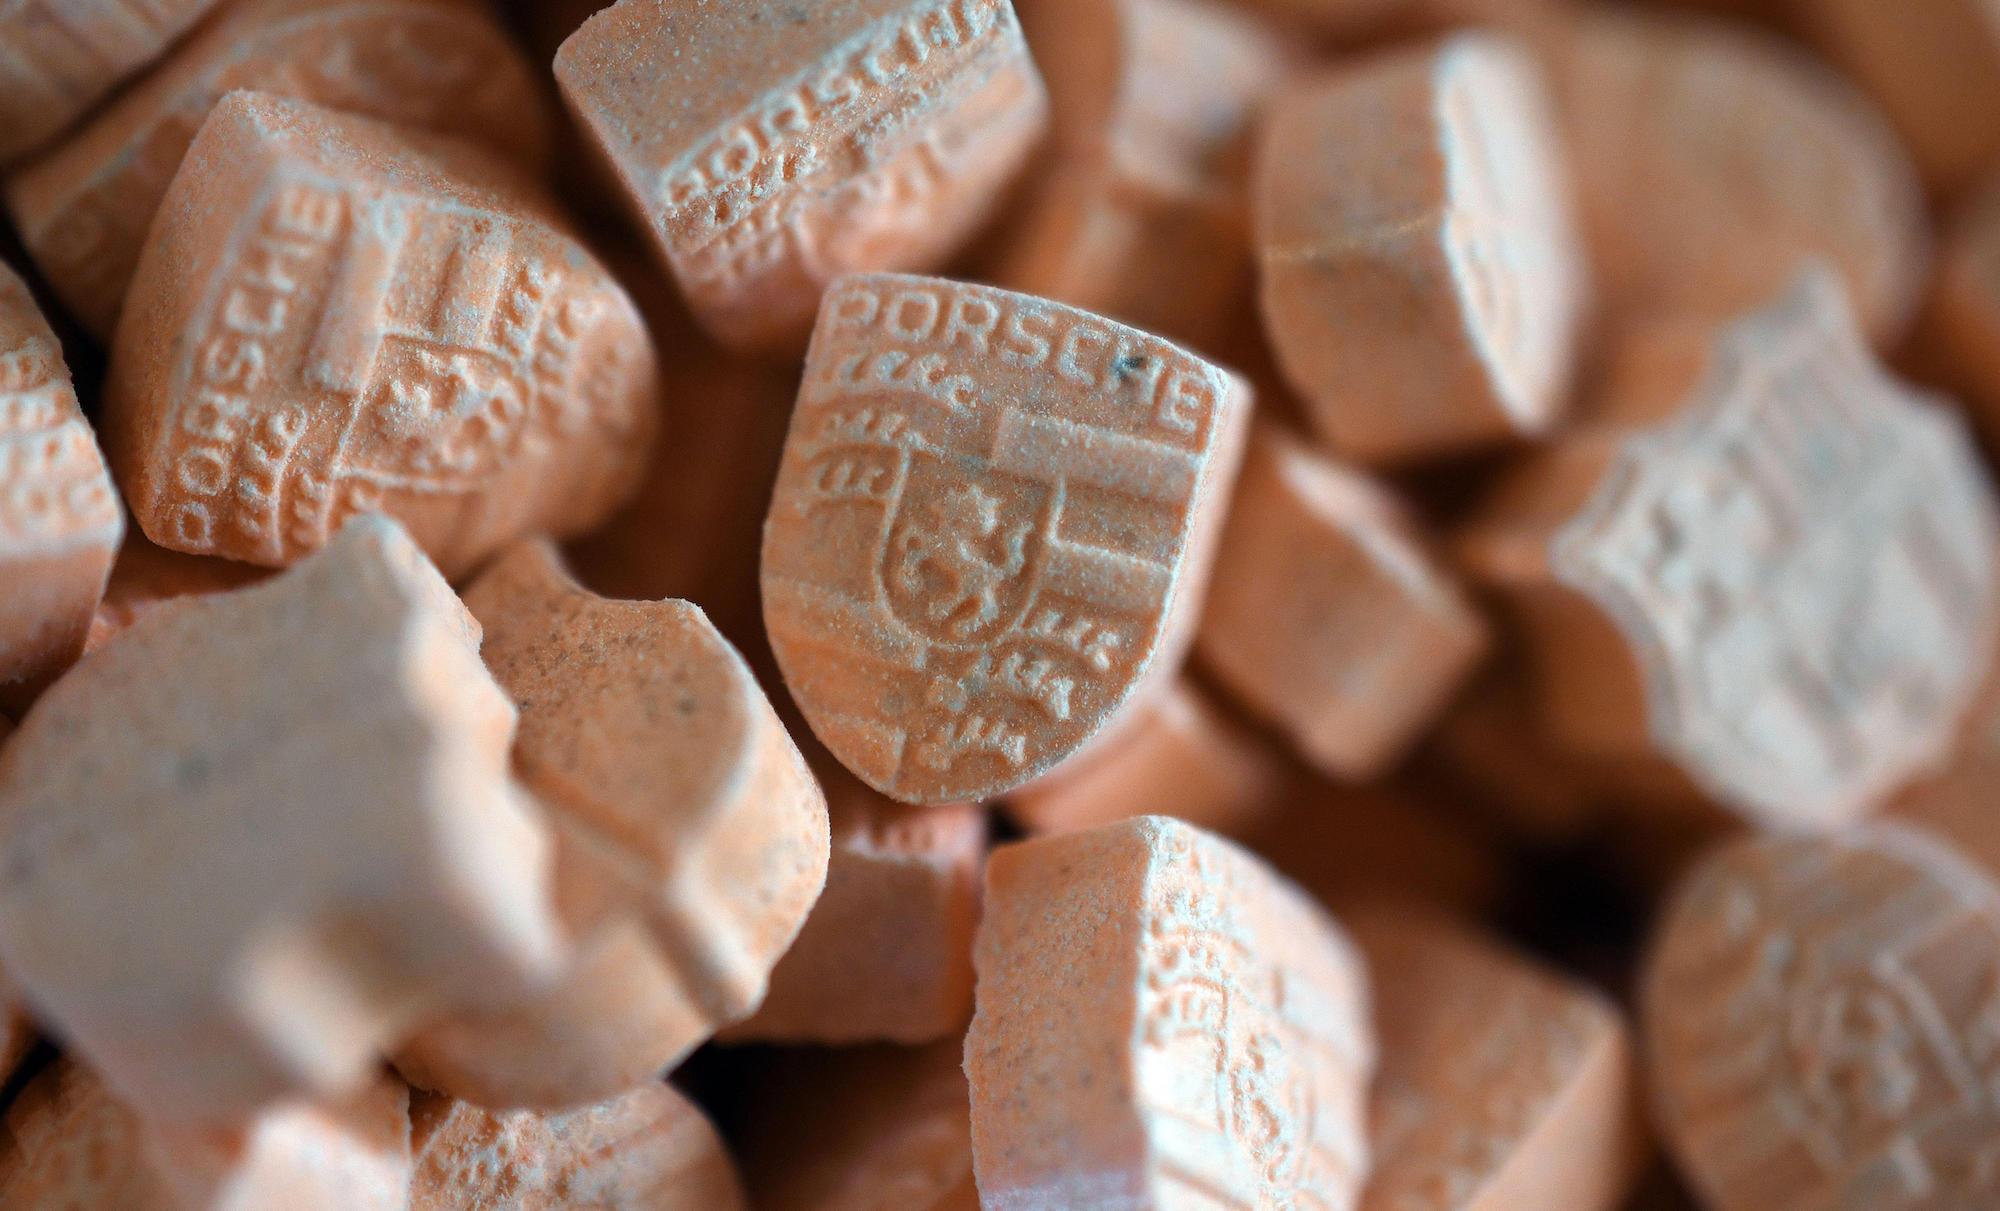 Ecstasy ar inte sa farligt